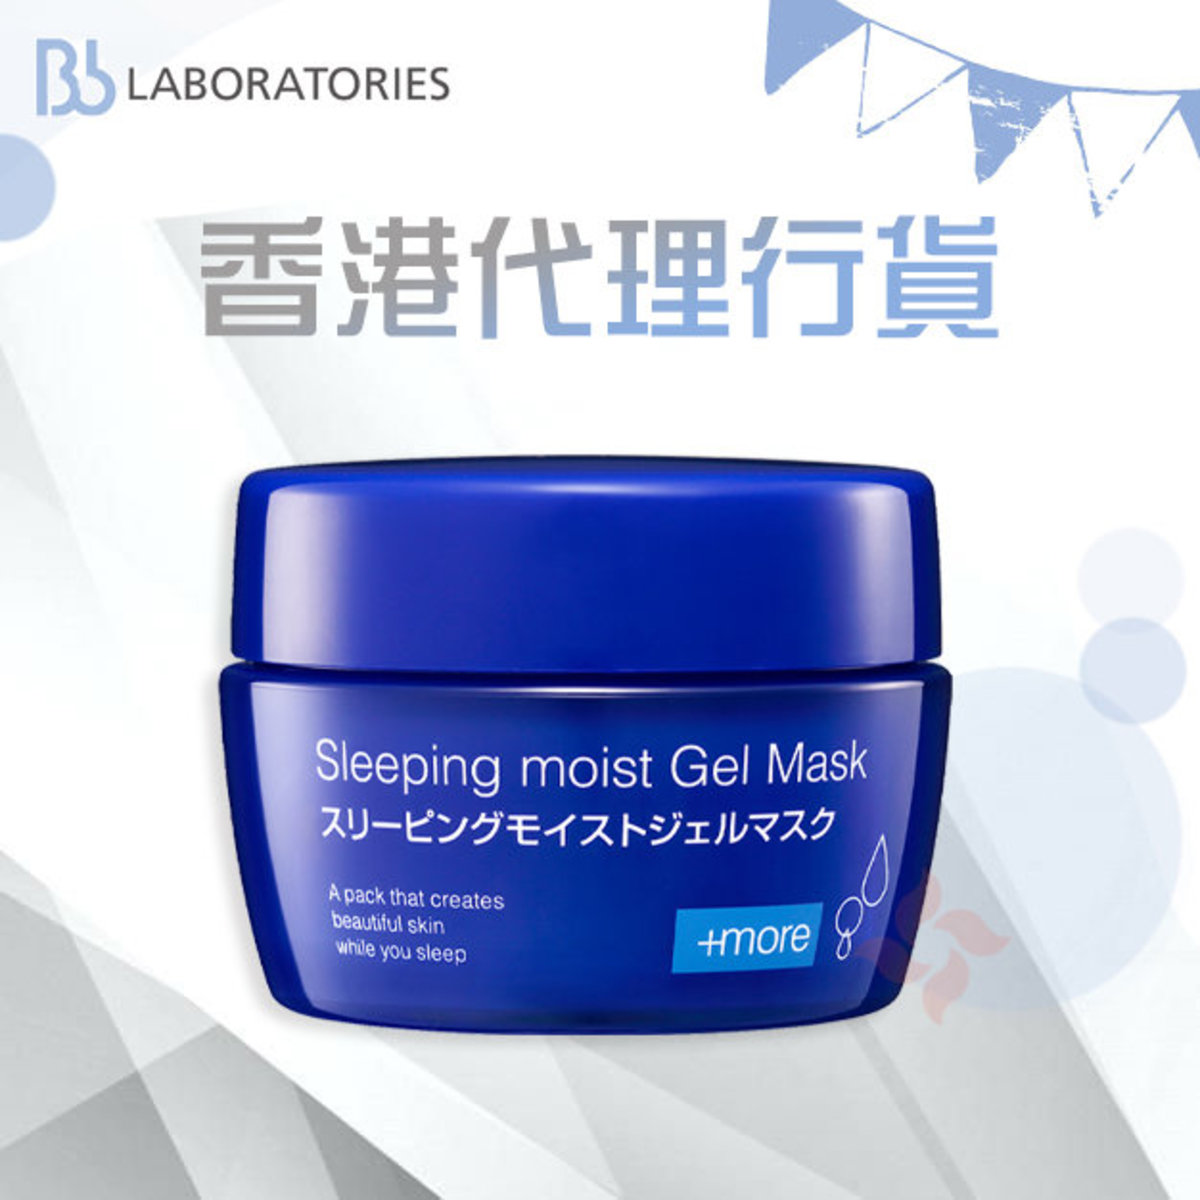 Sleeping Moist Gel Mask 80g (4520060622005)